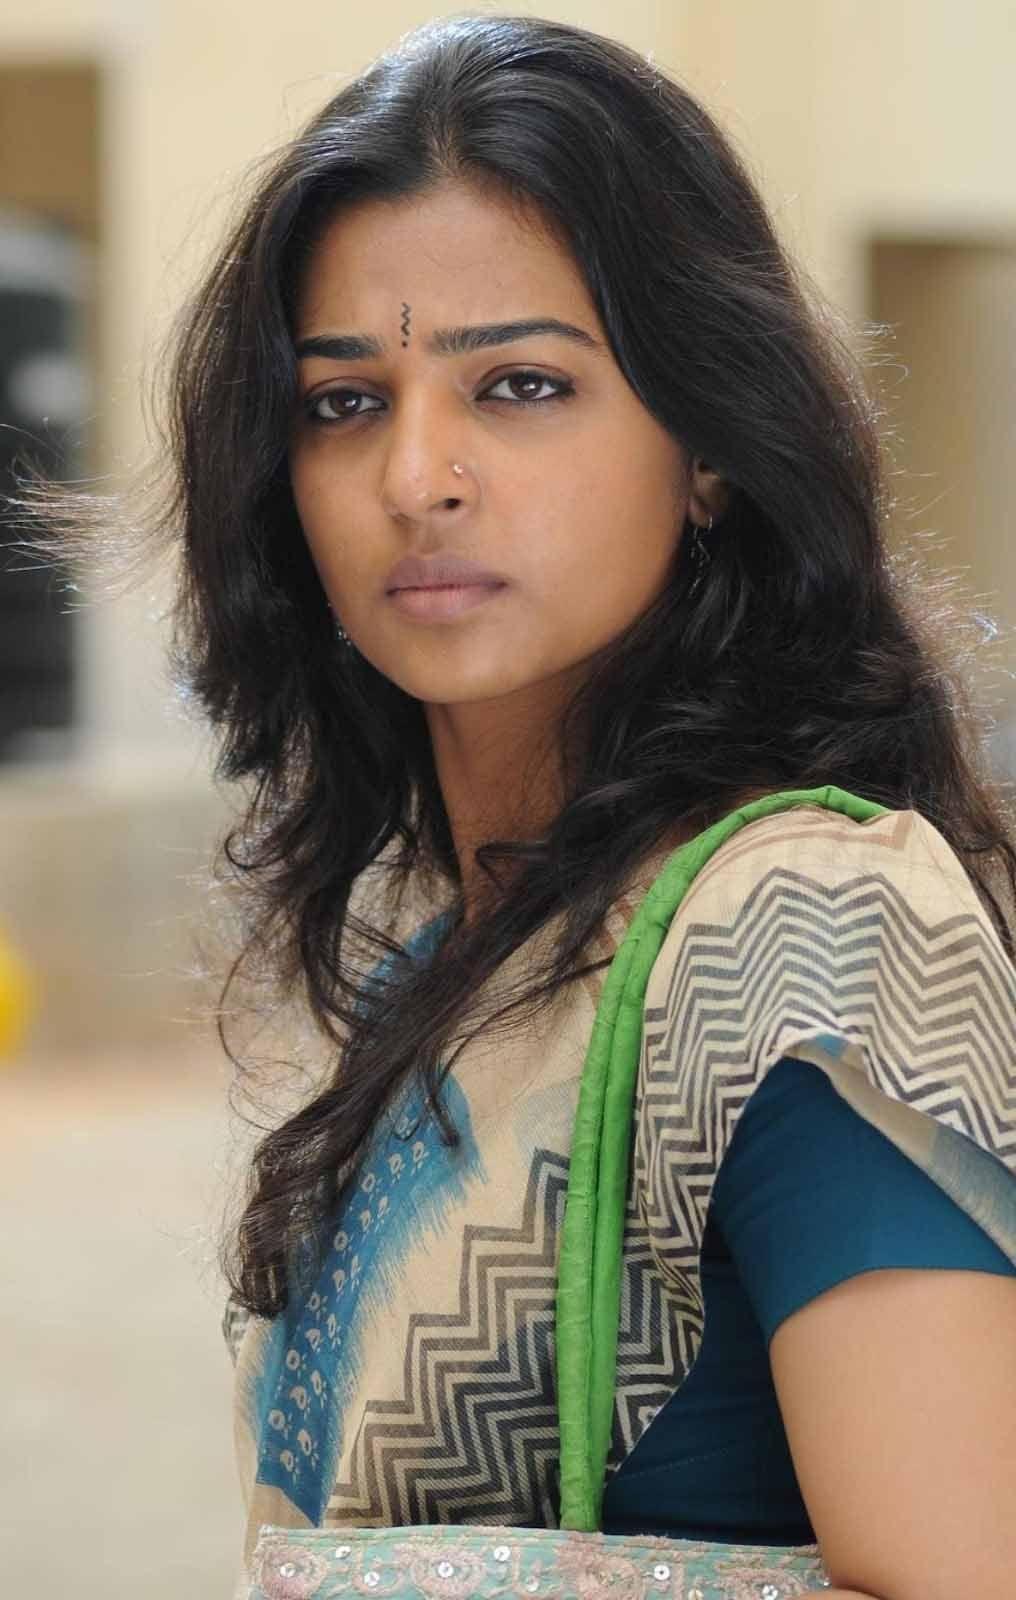 The Dark Amp Dusky Around The World Photo Most Beautiful Indian Actress Dehati Girl Photo Beautiful Girl Face